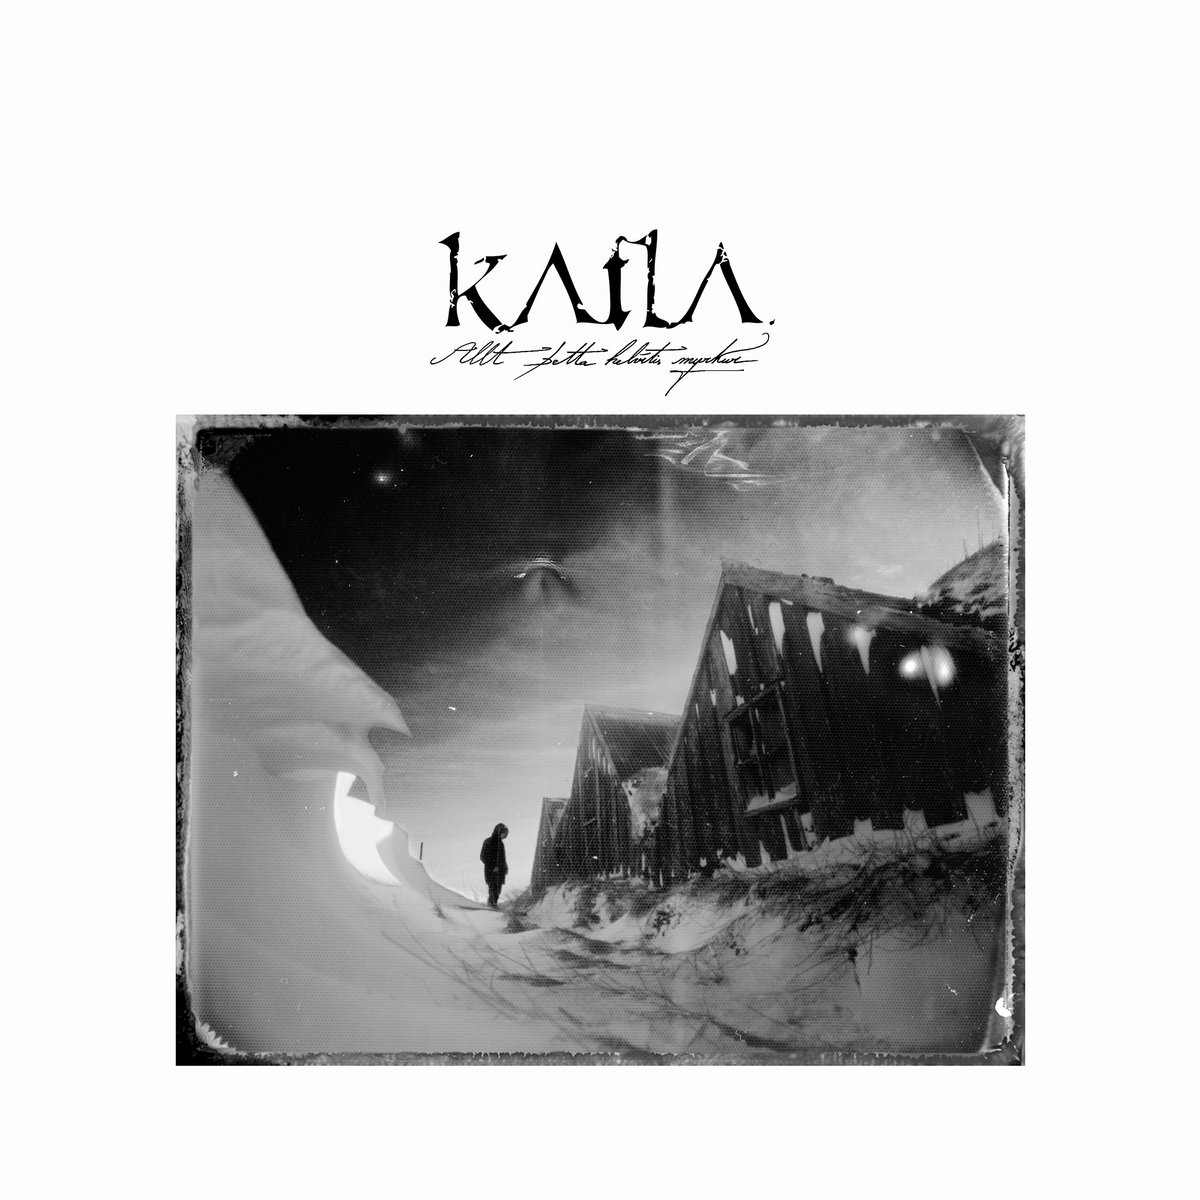 katla Allt Betta Helvítis Myrkur album cover artwork